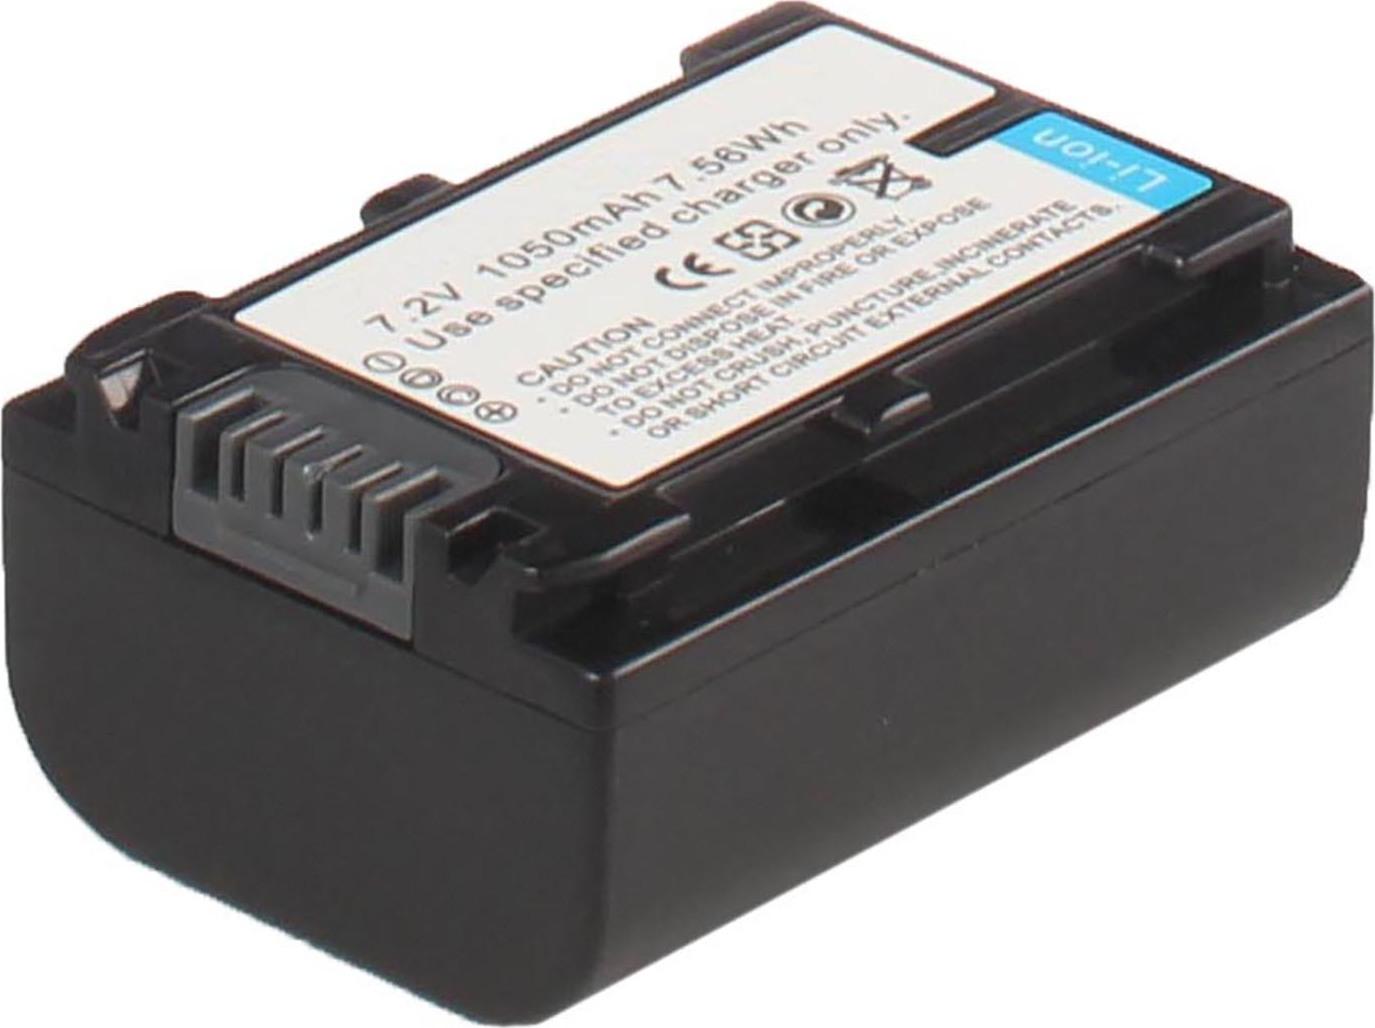 Аккумуляторная батарея iBatt iB-T2-F298 600mAh для камер Sony HDR-CX110, HDR-XR150E, HDR-PJ10E, NEX-VG30EH, DCR-SX63, NEX-VG10E, DCR-SX20E, HDR-CX350E, HDR-XR150, HDR-CX320E, DCR-SX63E, HDR-CX200, HDR-HC9E, DCR-SX21E, HDR-CX210E, NEX-VG10, DCR-SX85E,